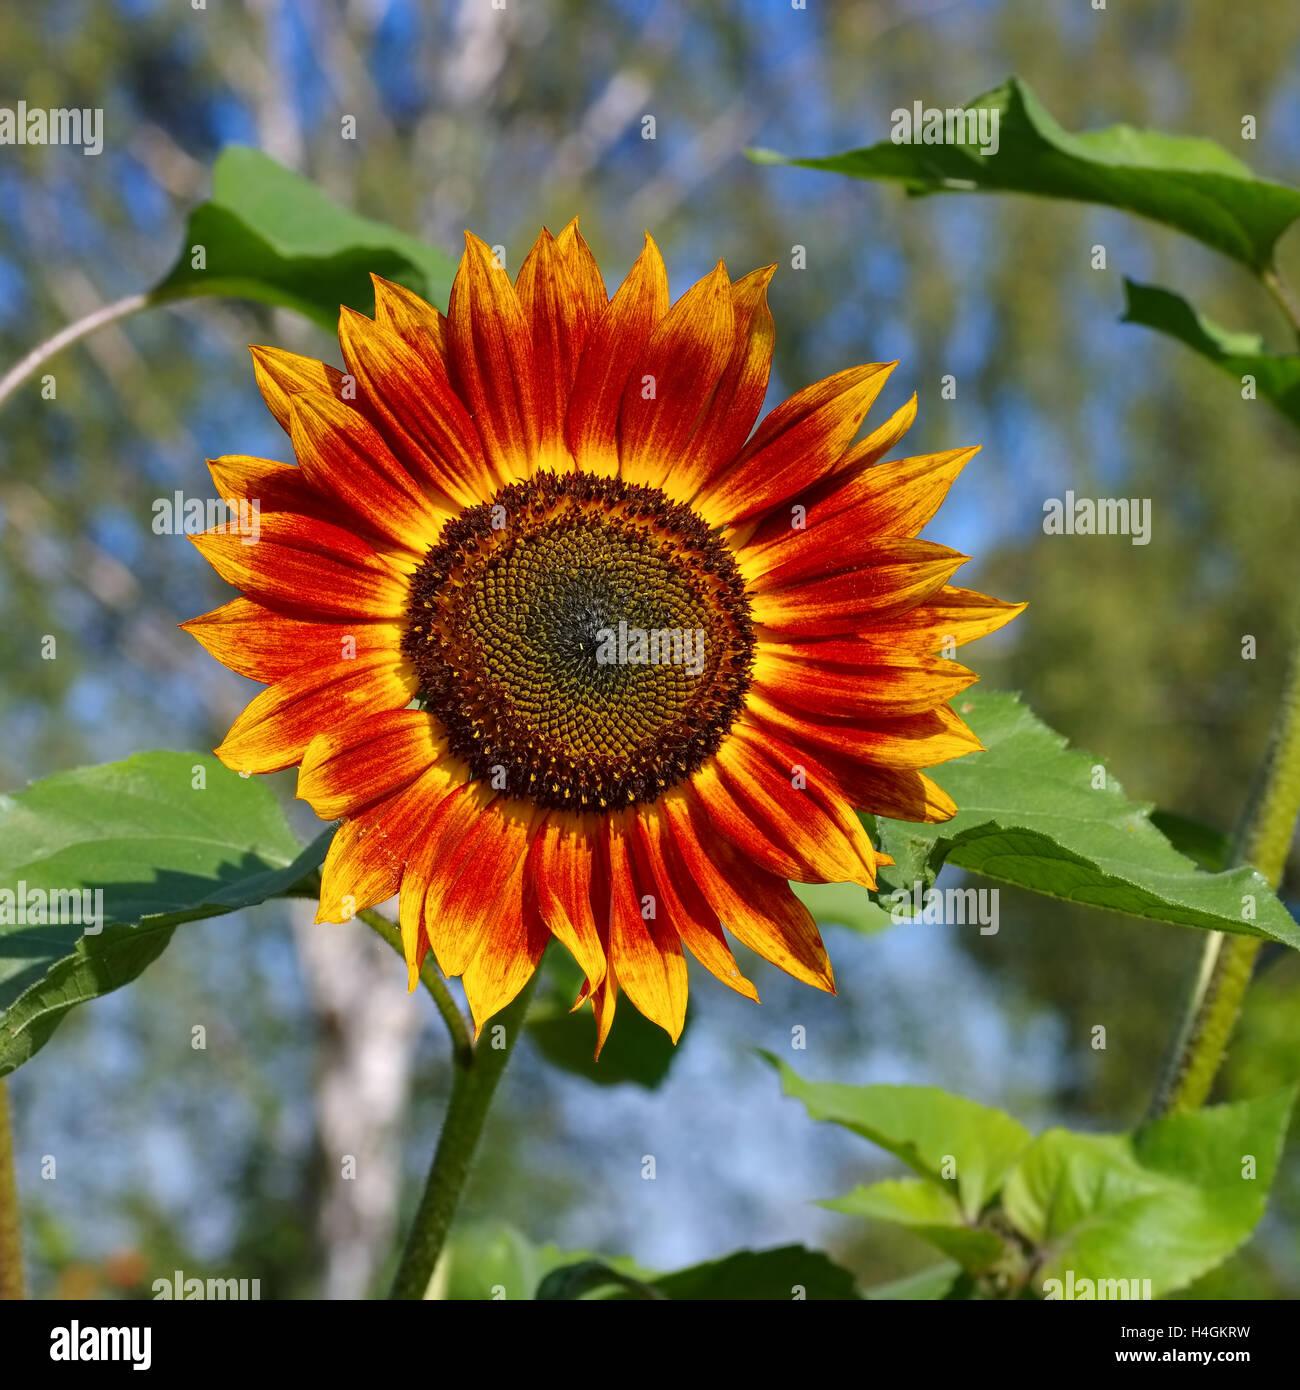 einzelne Sonnenblume im Sommer - single sunflower in summer, garden plant - Stock Image